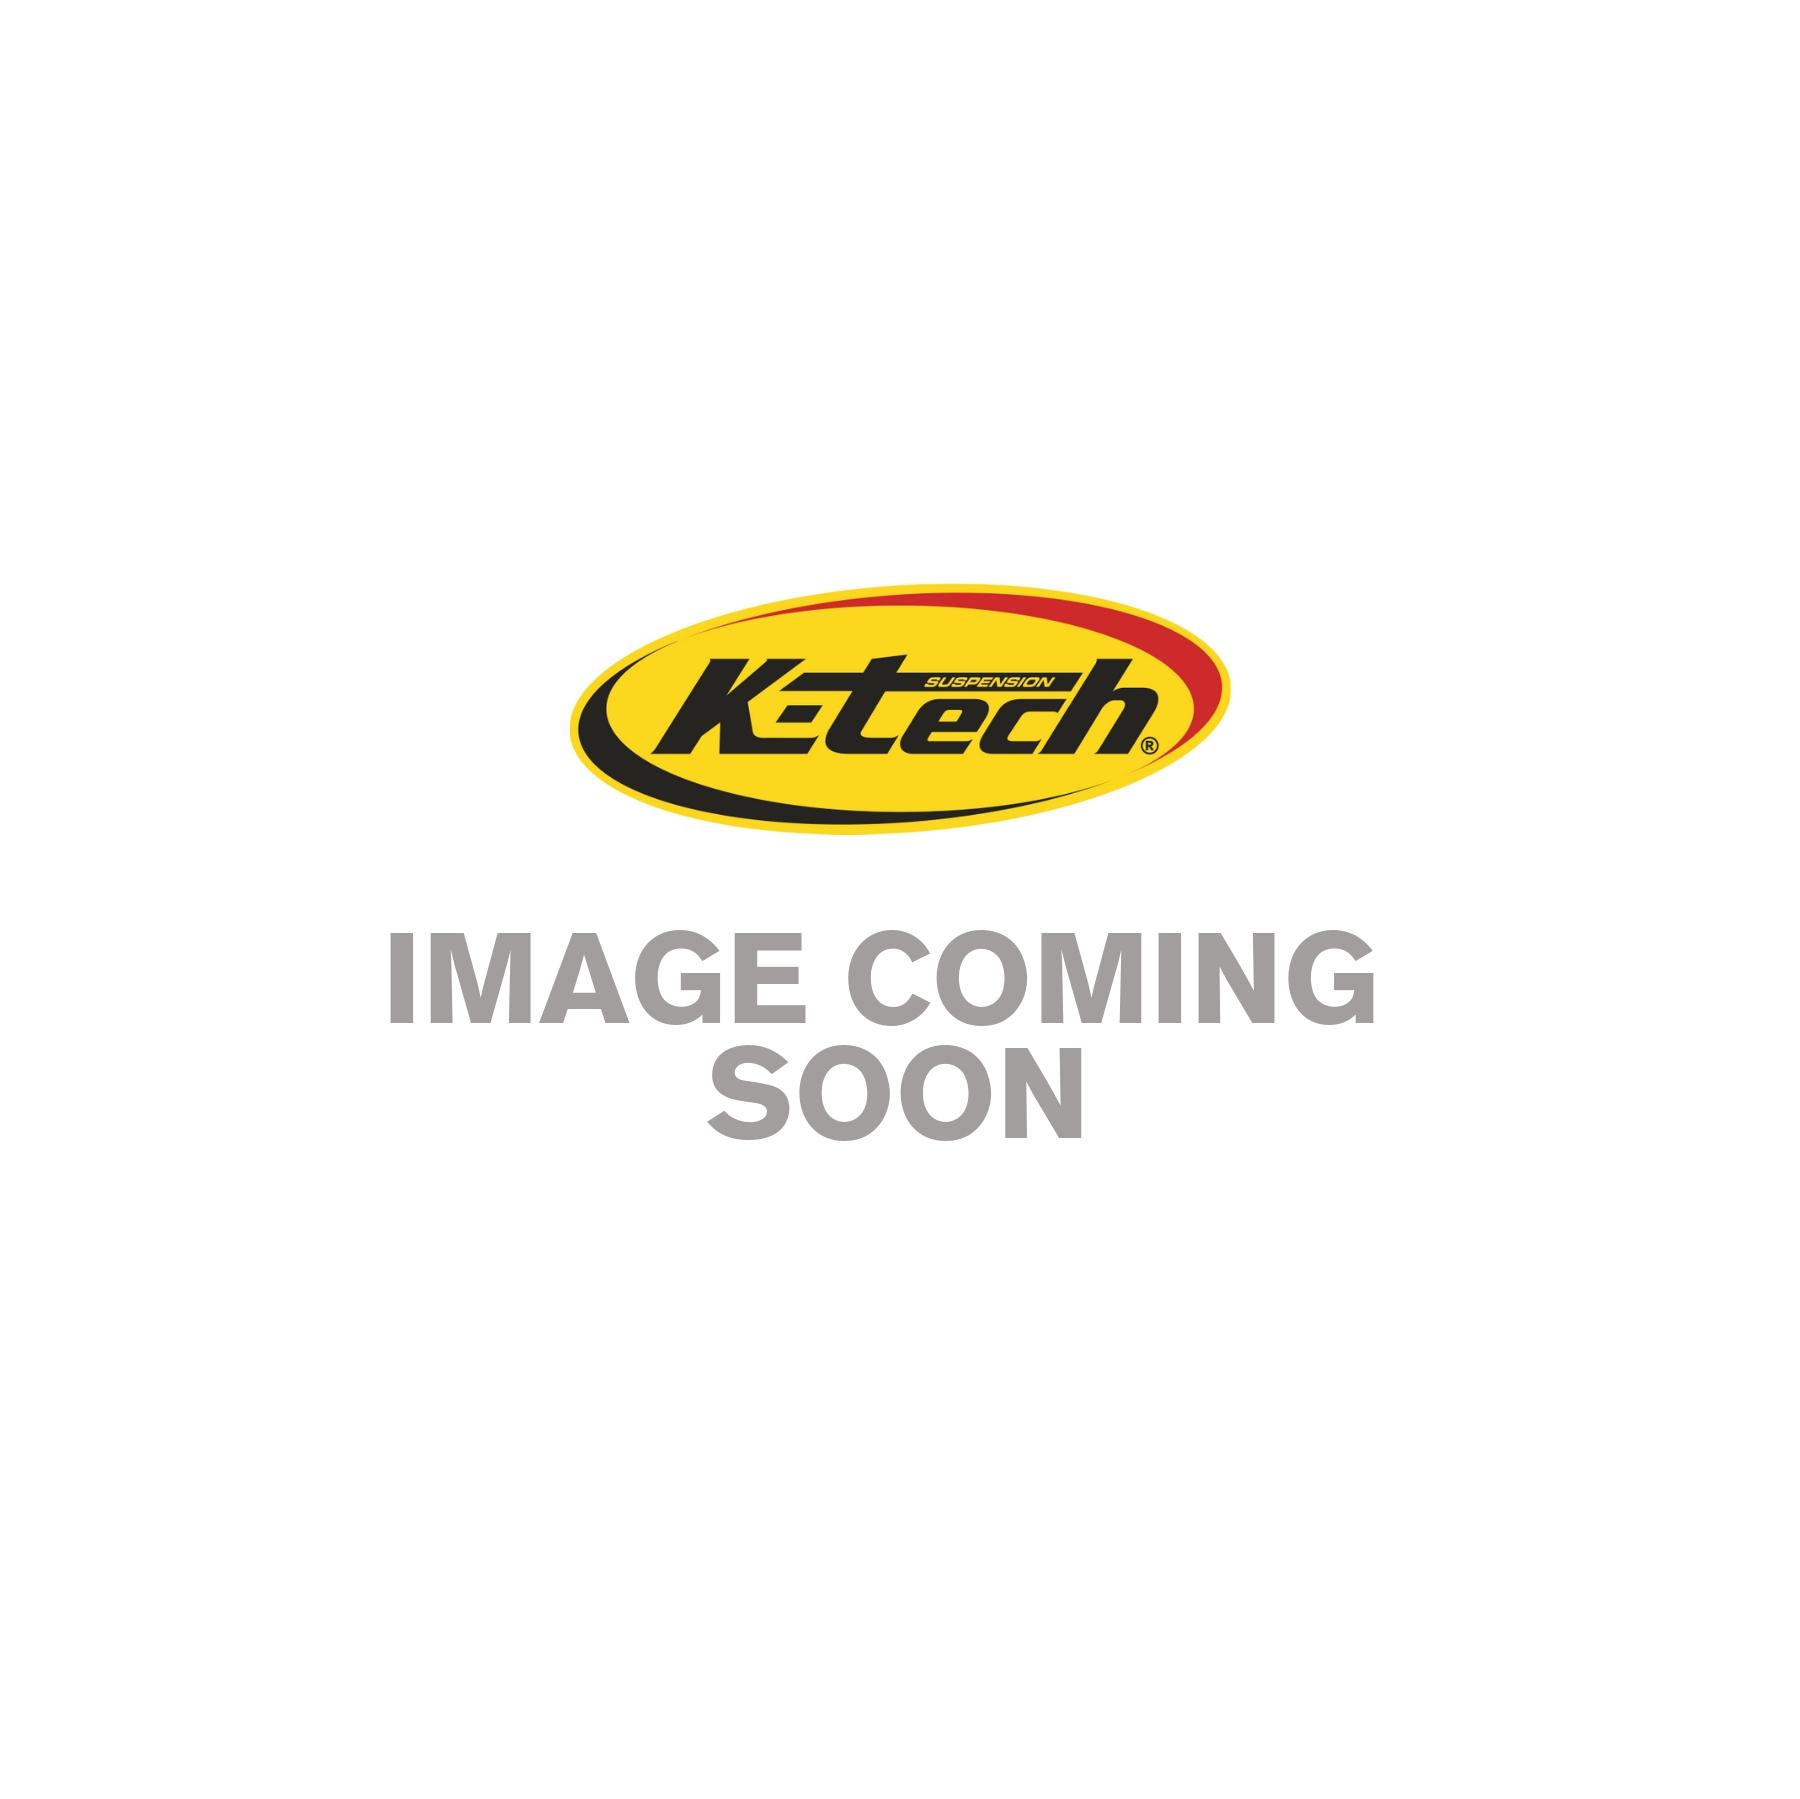 ORVS Front Fork Piston Kit WP 4860 MXMA Open Cartridge